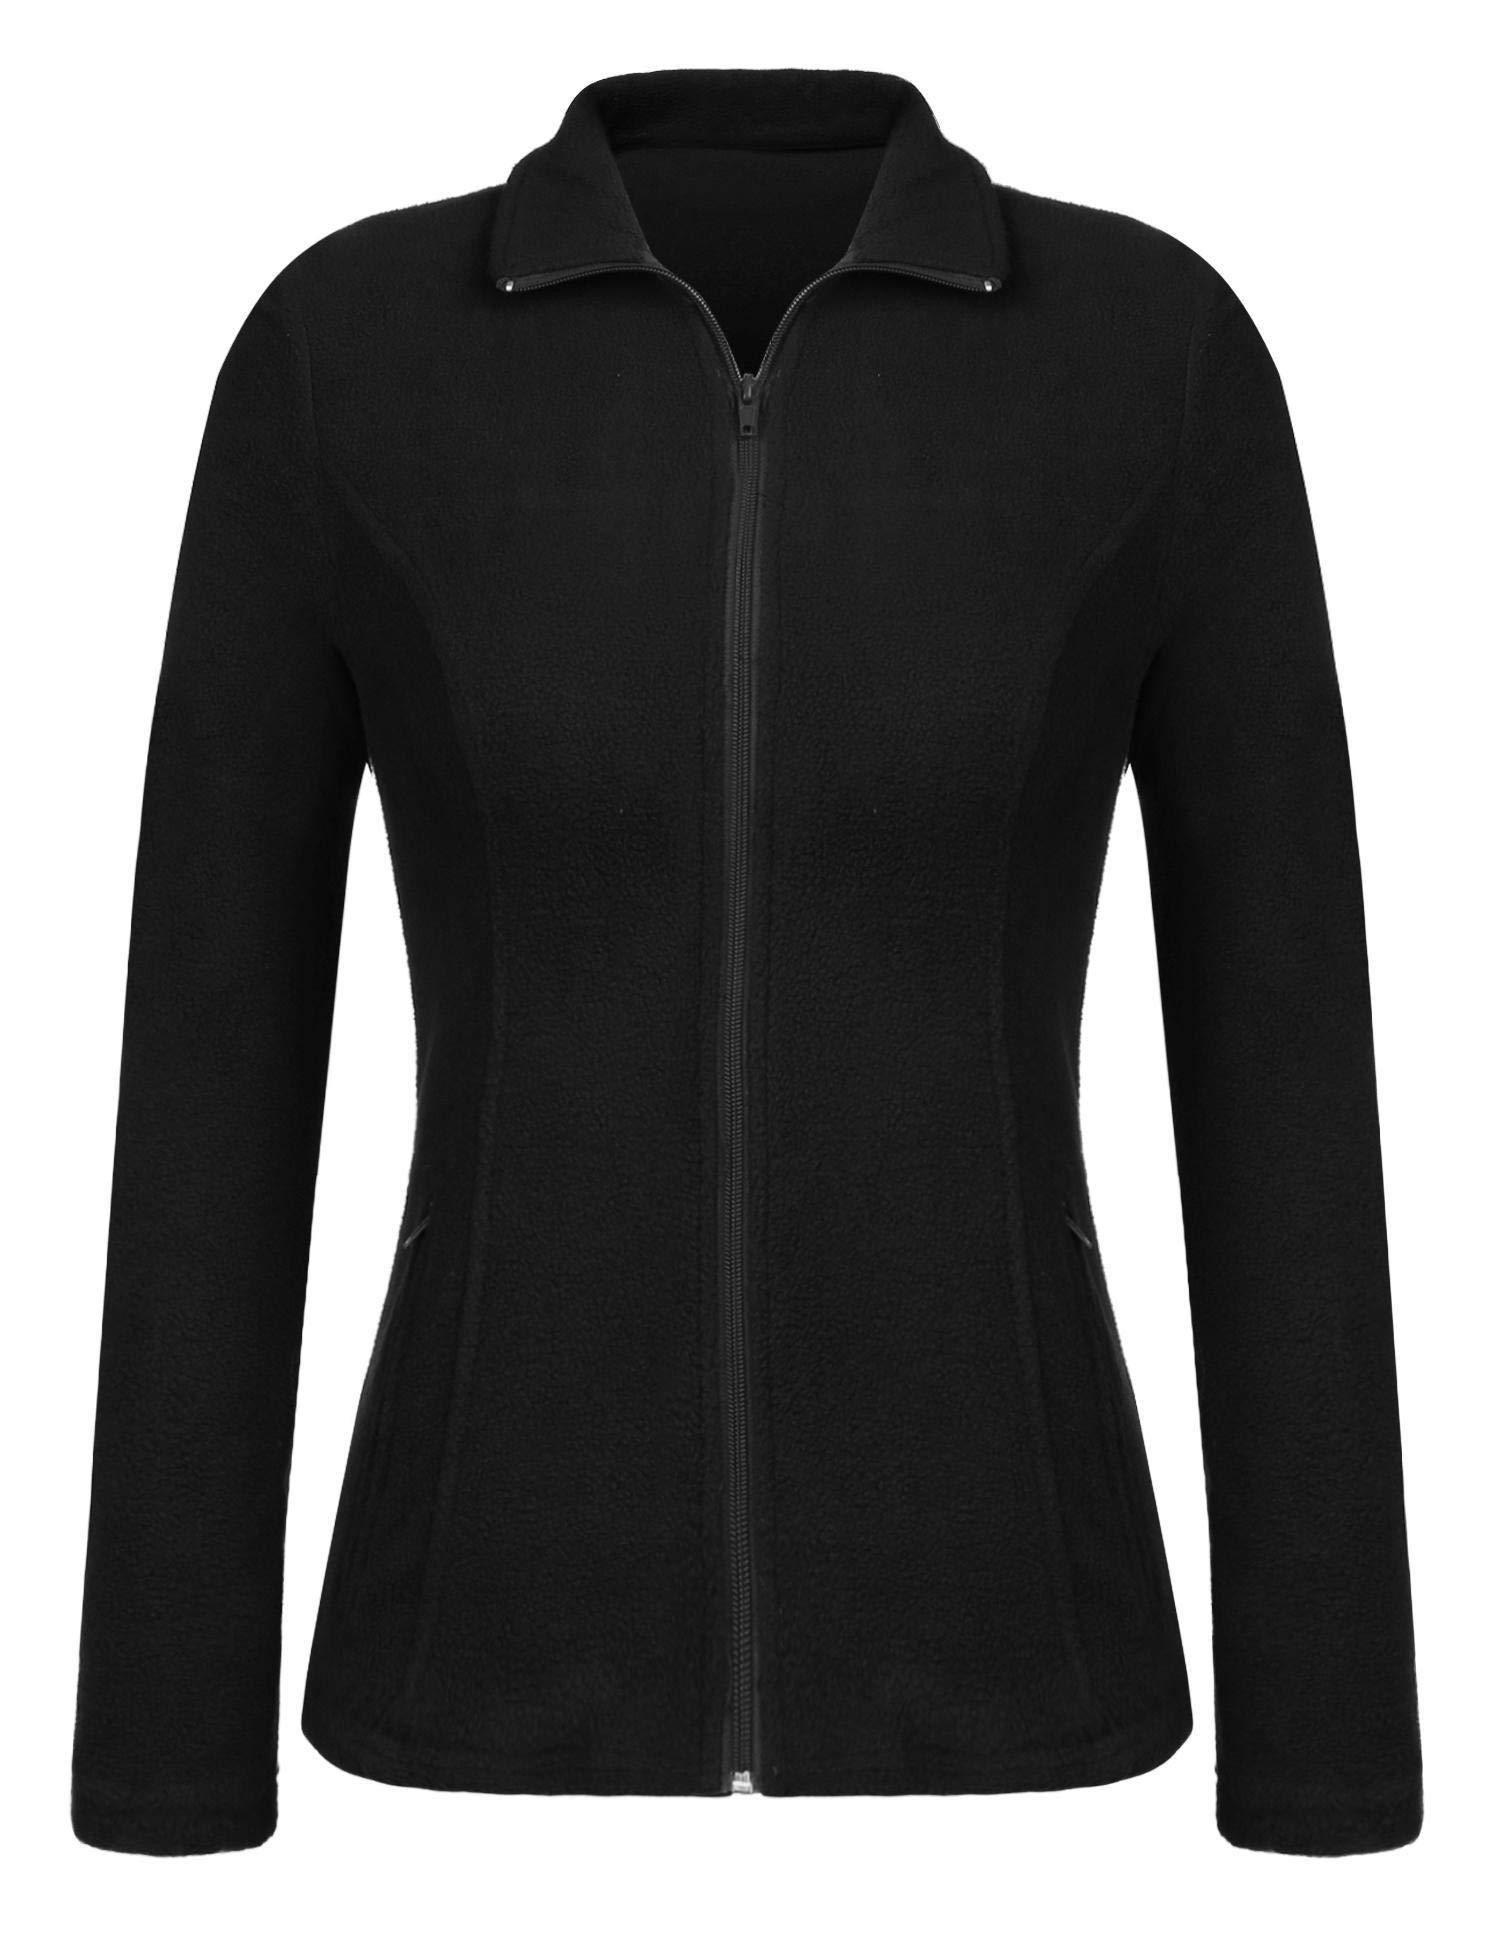 Grabsa Women's Fit Lightweight Winter Coat Classic Breathable Full-Zip Fleece Jacket Black L